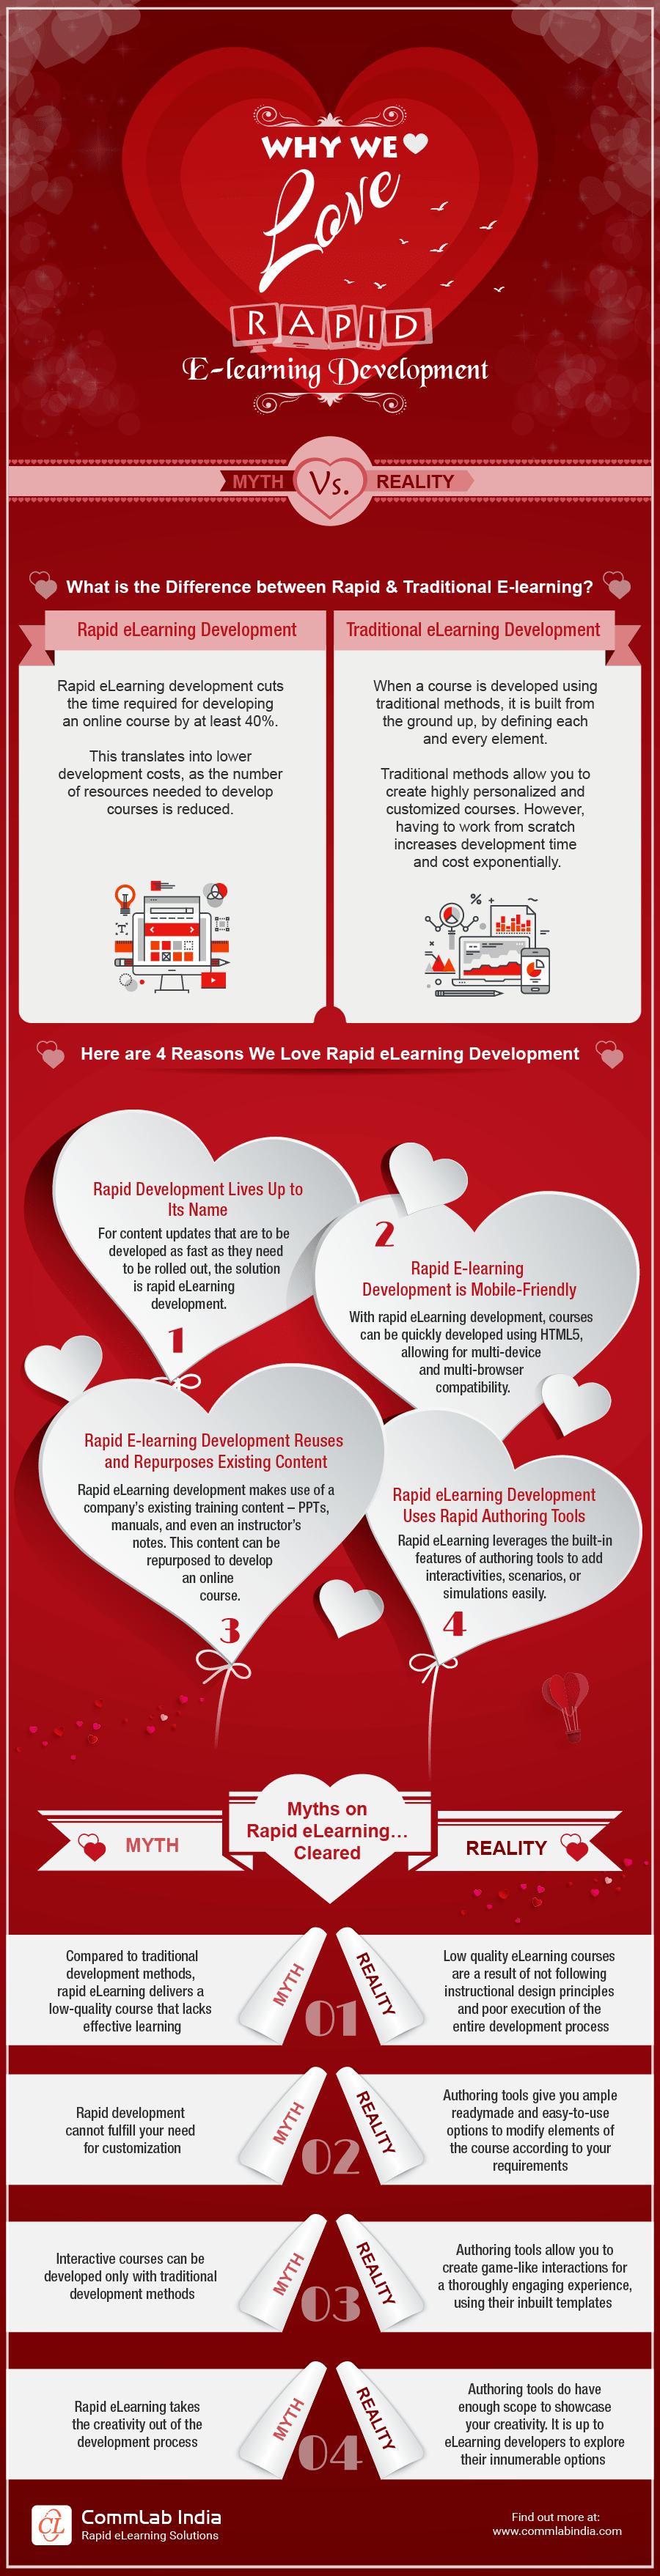 Why We Love Rapid eLearning Development: Myth Vs. Reality